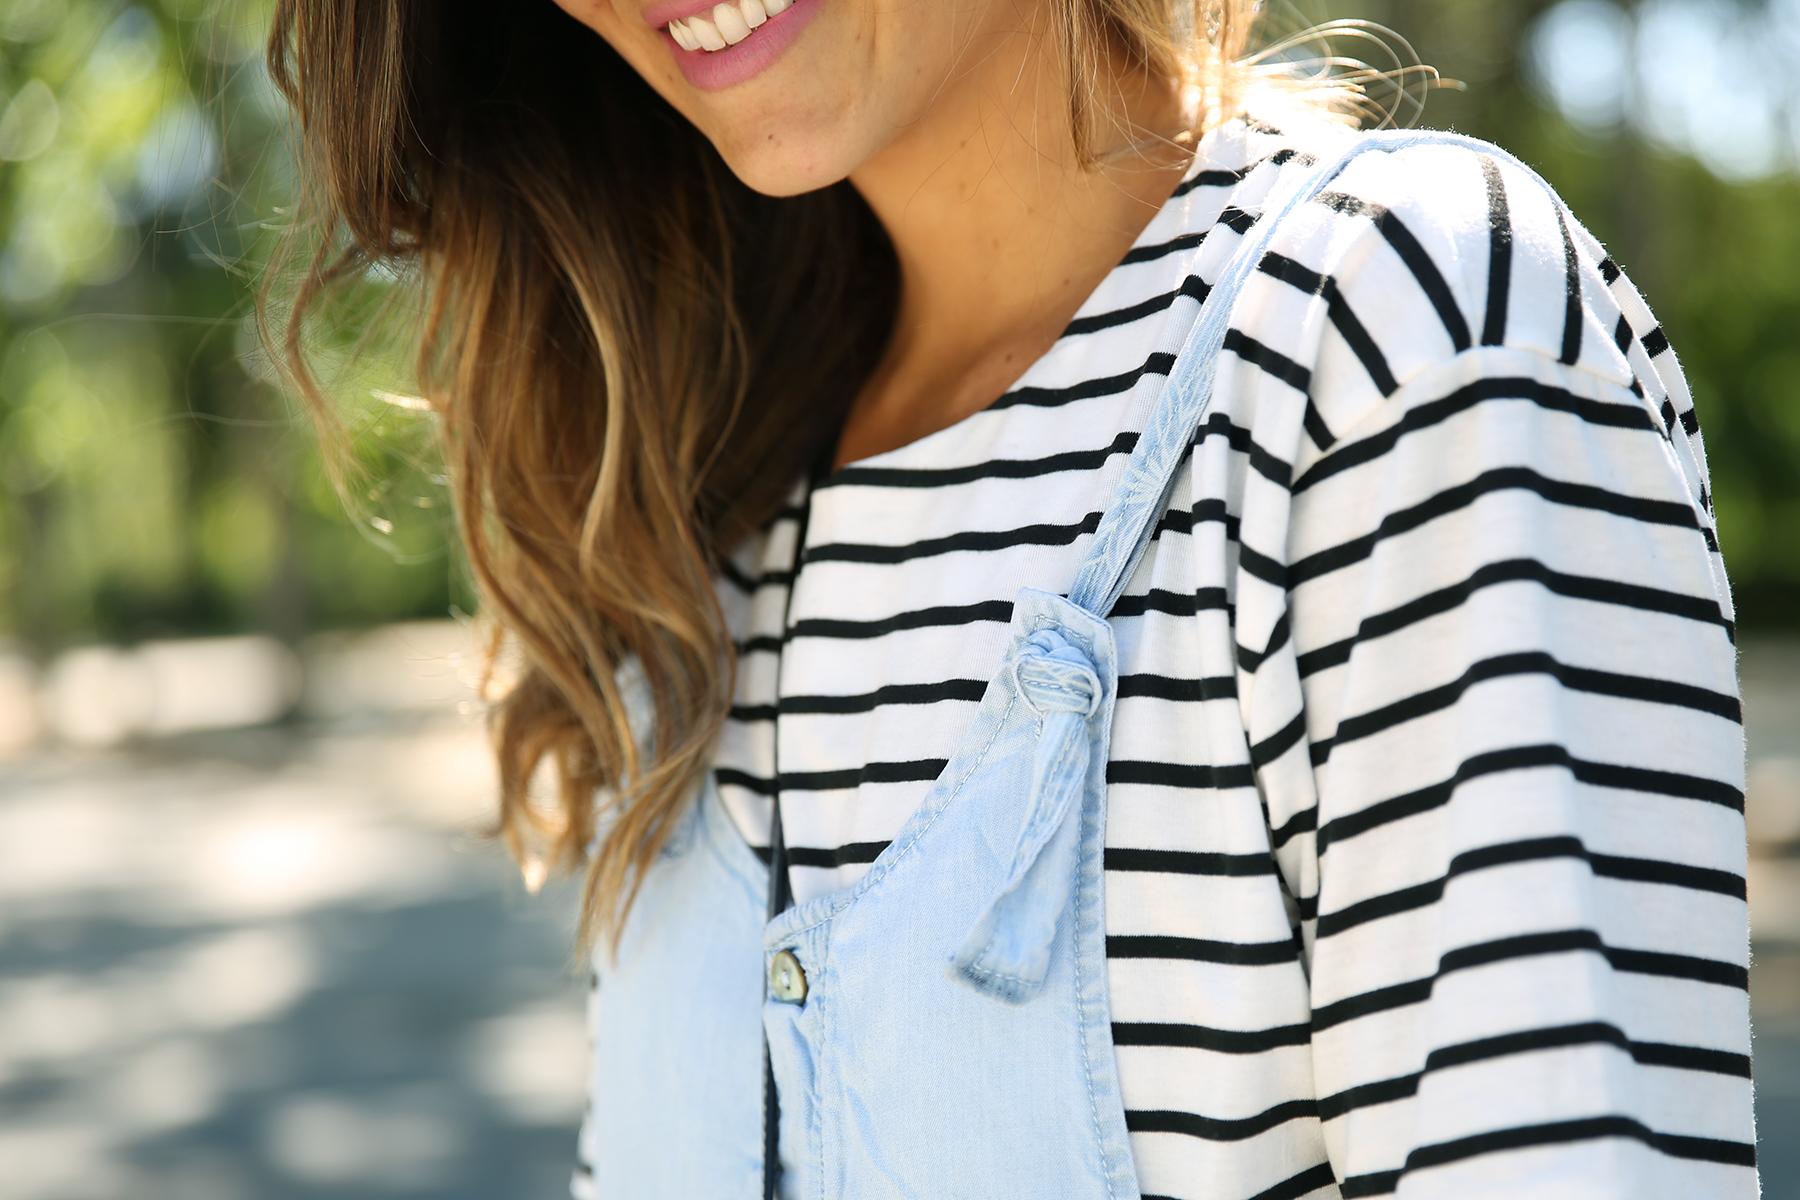 trendy_taste-look-outfit-street_style-ootd-blog-blogger-fashion_spain-vaquero_claro-peto_vaquero-tirantes-striped_tee-camiseta_rayas-marinero-dior_sunnies-gaimo-7